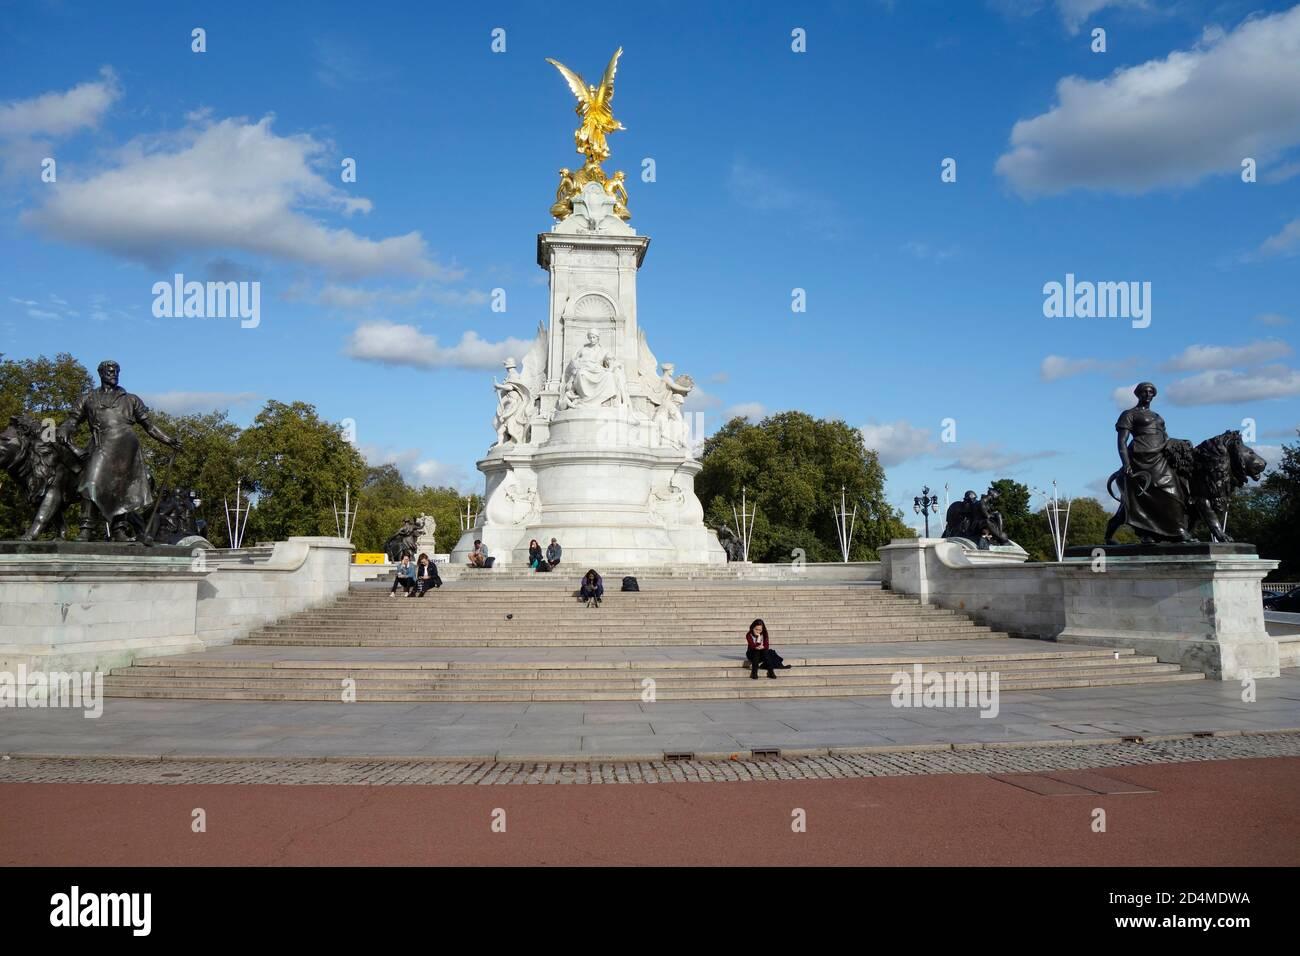 Monumento y estatua de la Reina Victoria frente al Palacio de Buckingham, Londres, Reino Unido. Foto de stock